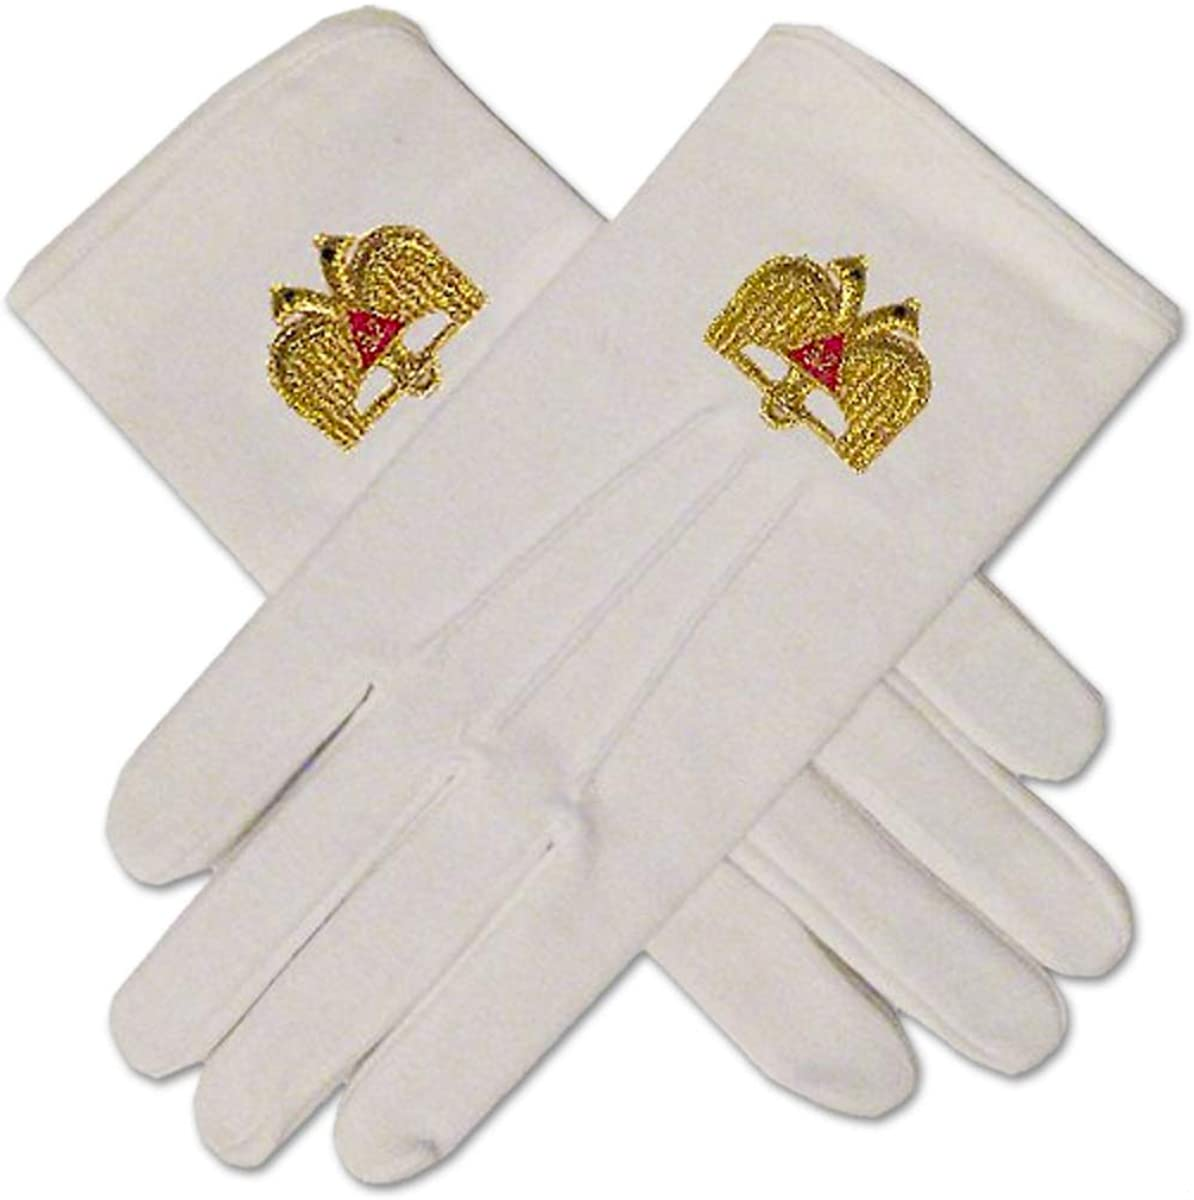 32nd Degree Scottish Rite Masonic Embroidered Cotton Gloves - [White]